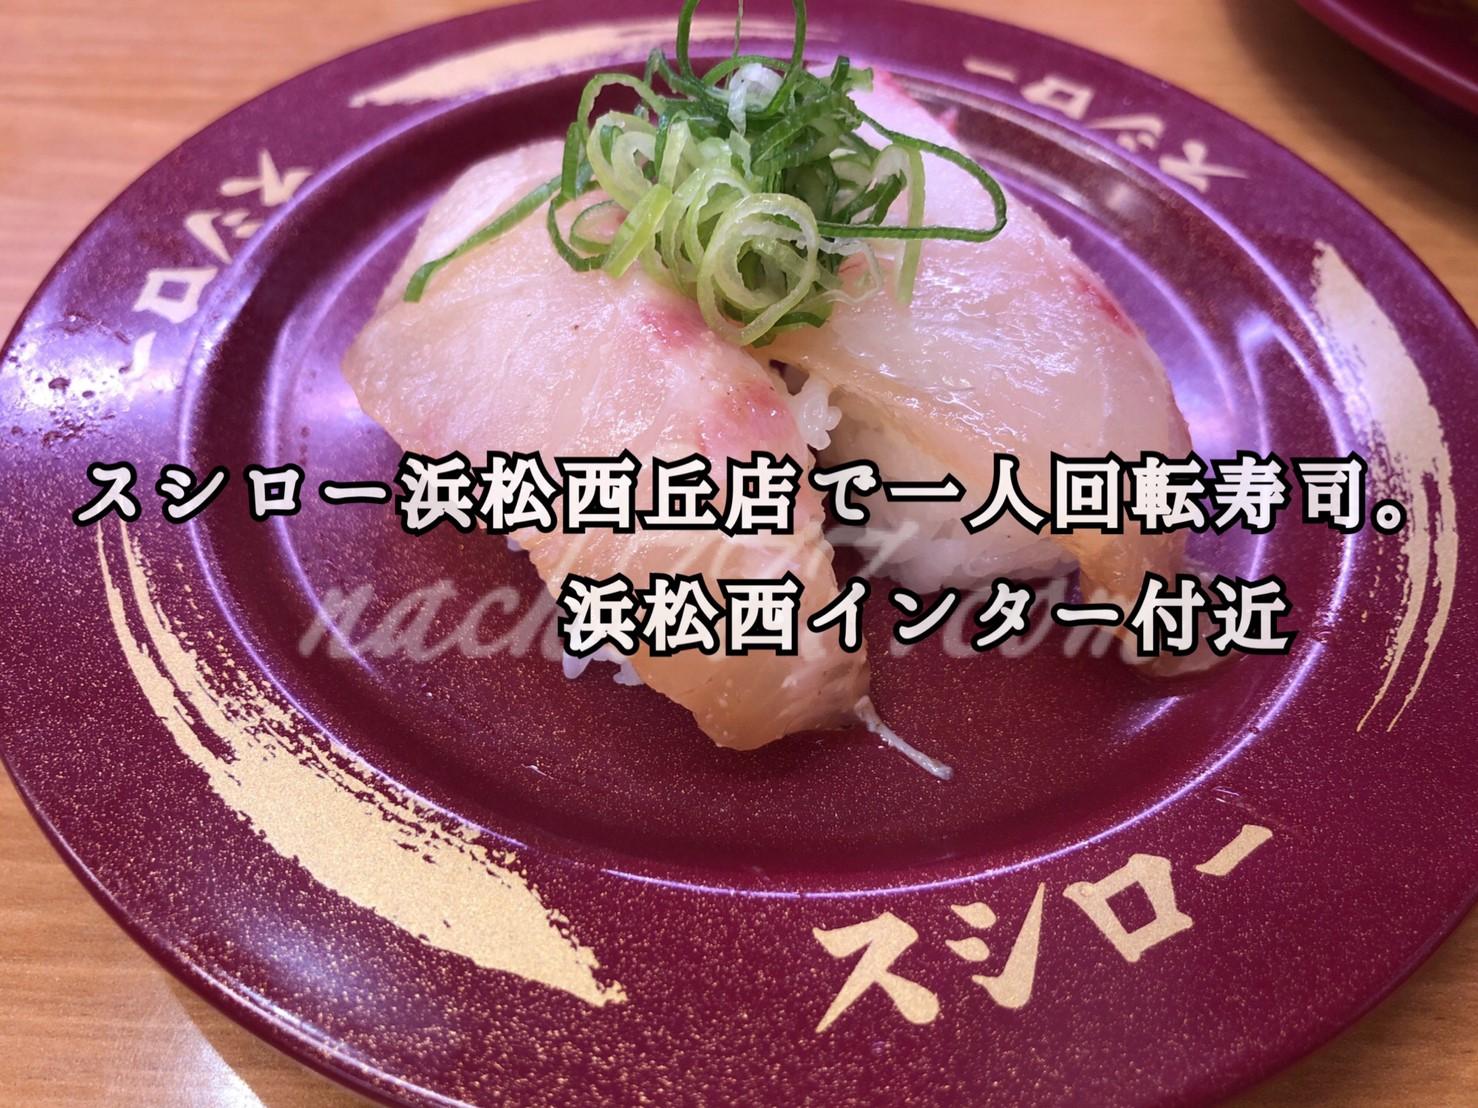 スシロー浜松西丘店で一人回転寿司。浜松西インター付近